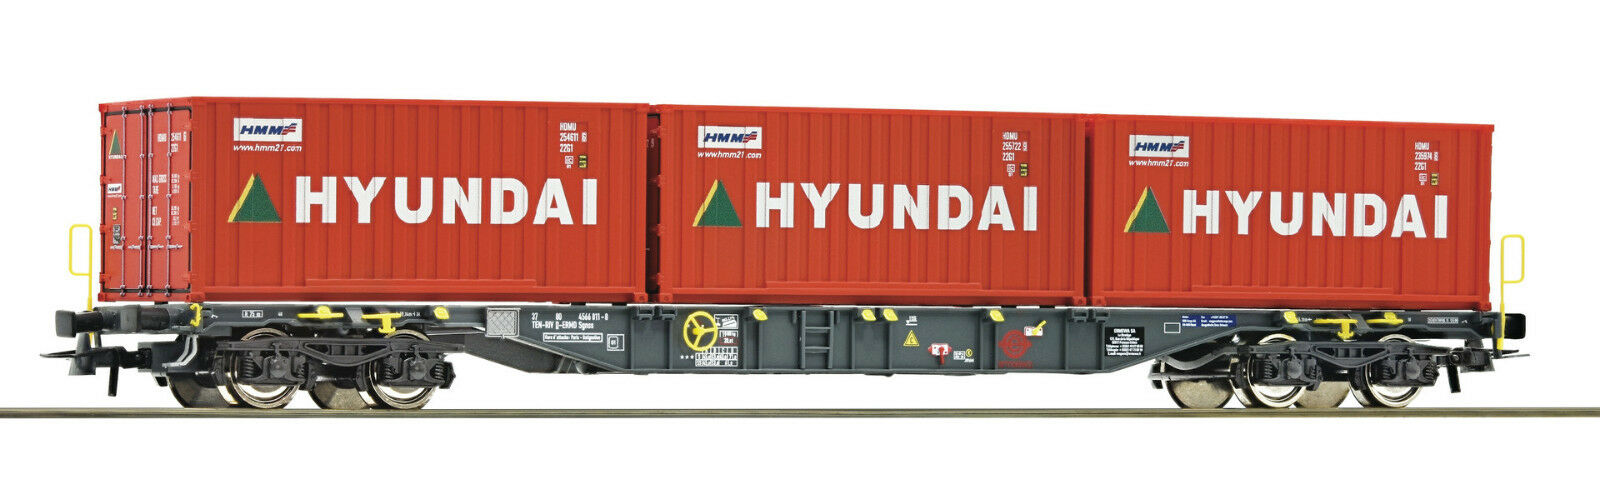 Roco 76932 contenedores carro ermewa hyundai a petición achstausch F. Märklin gratis